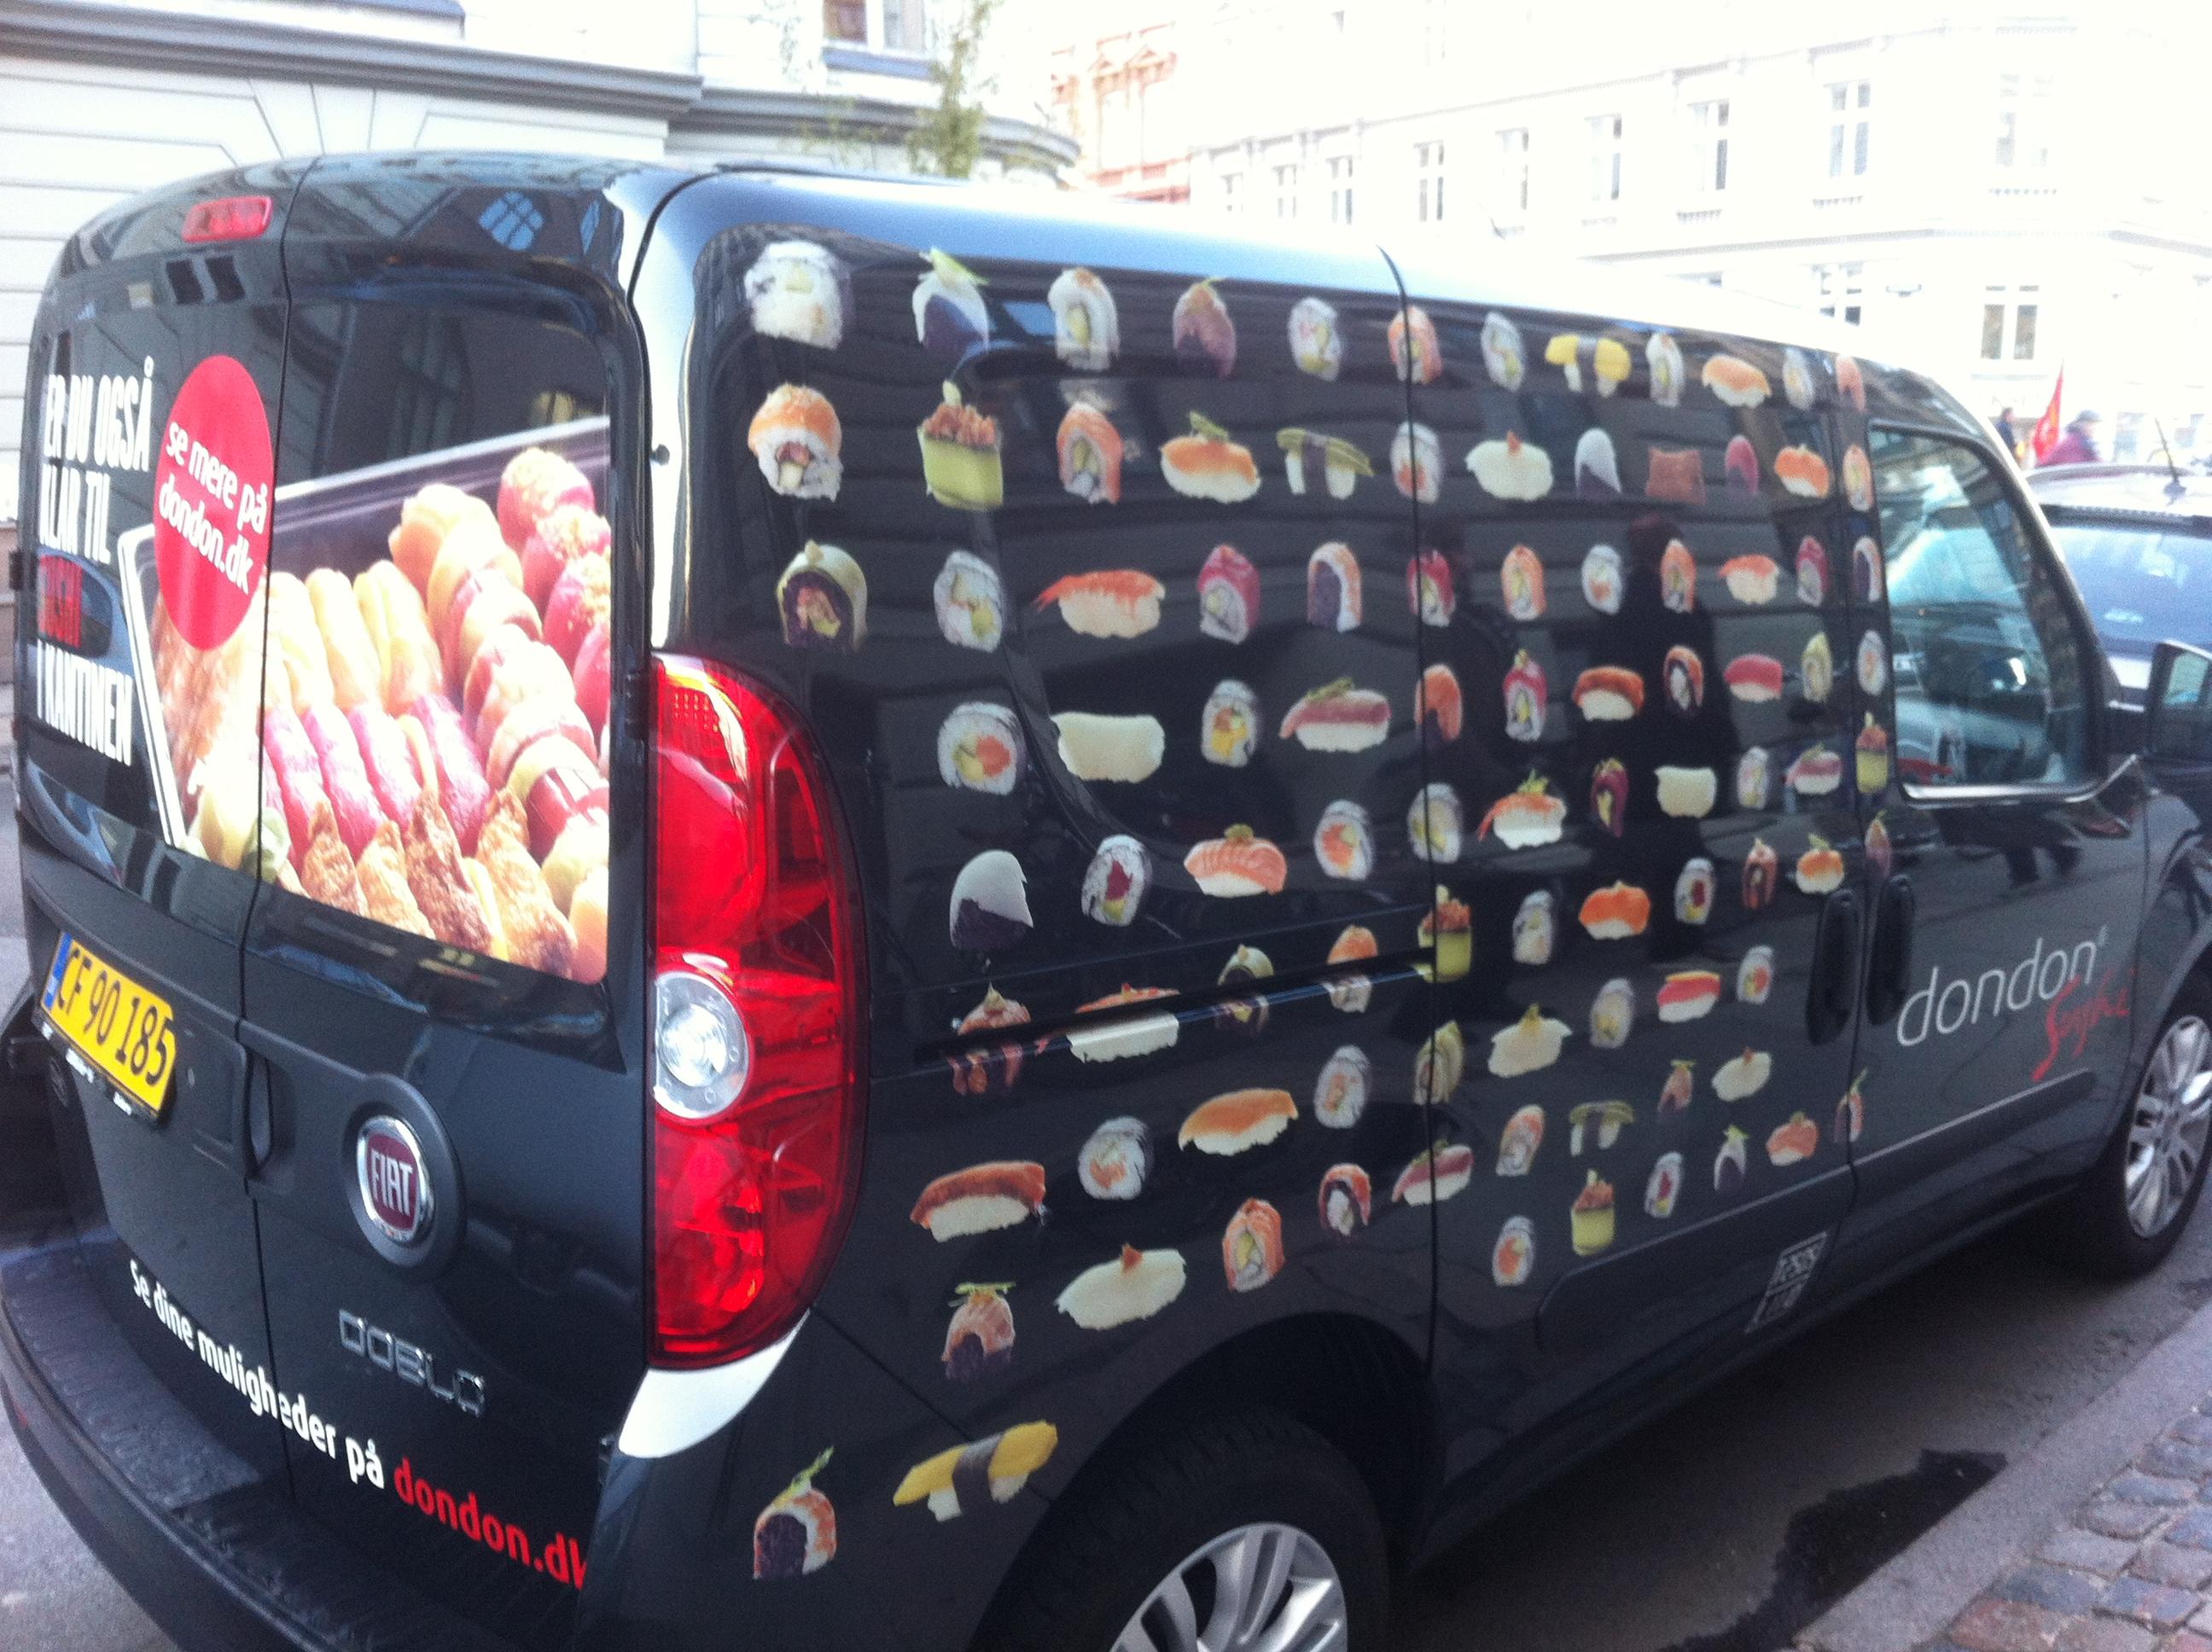 Dondon Sushi Copenhagen